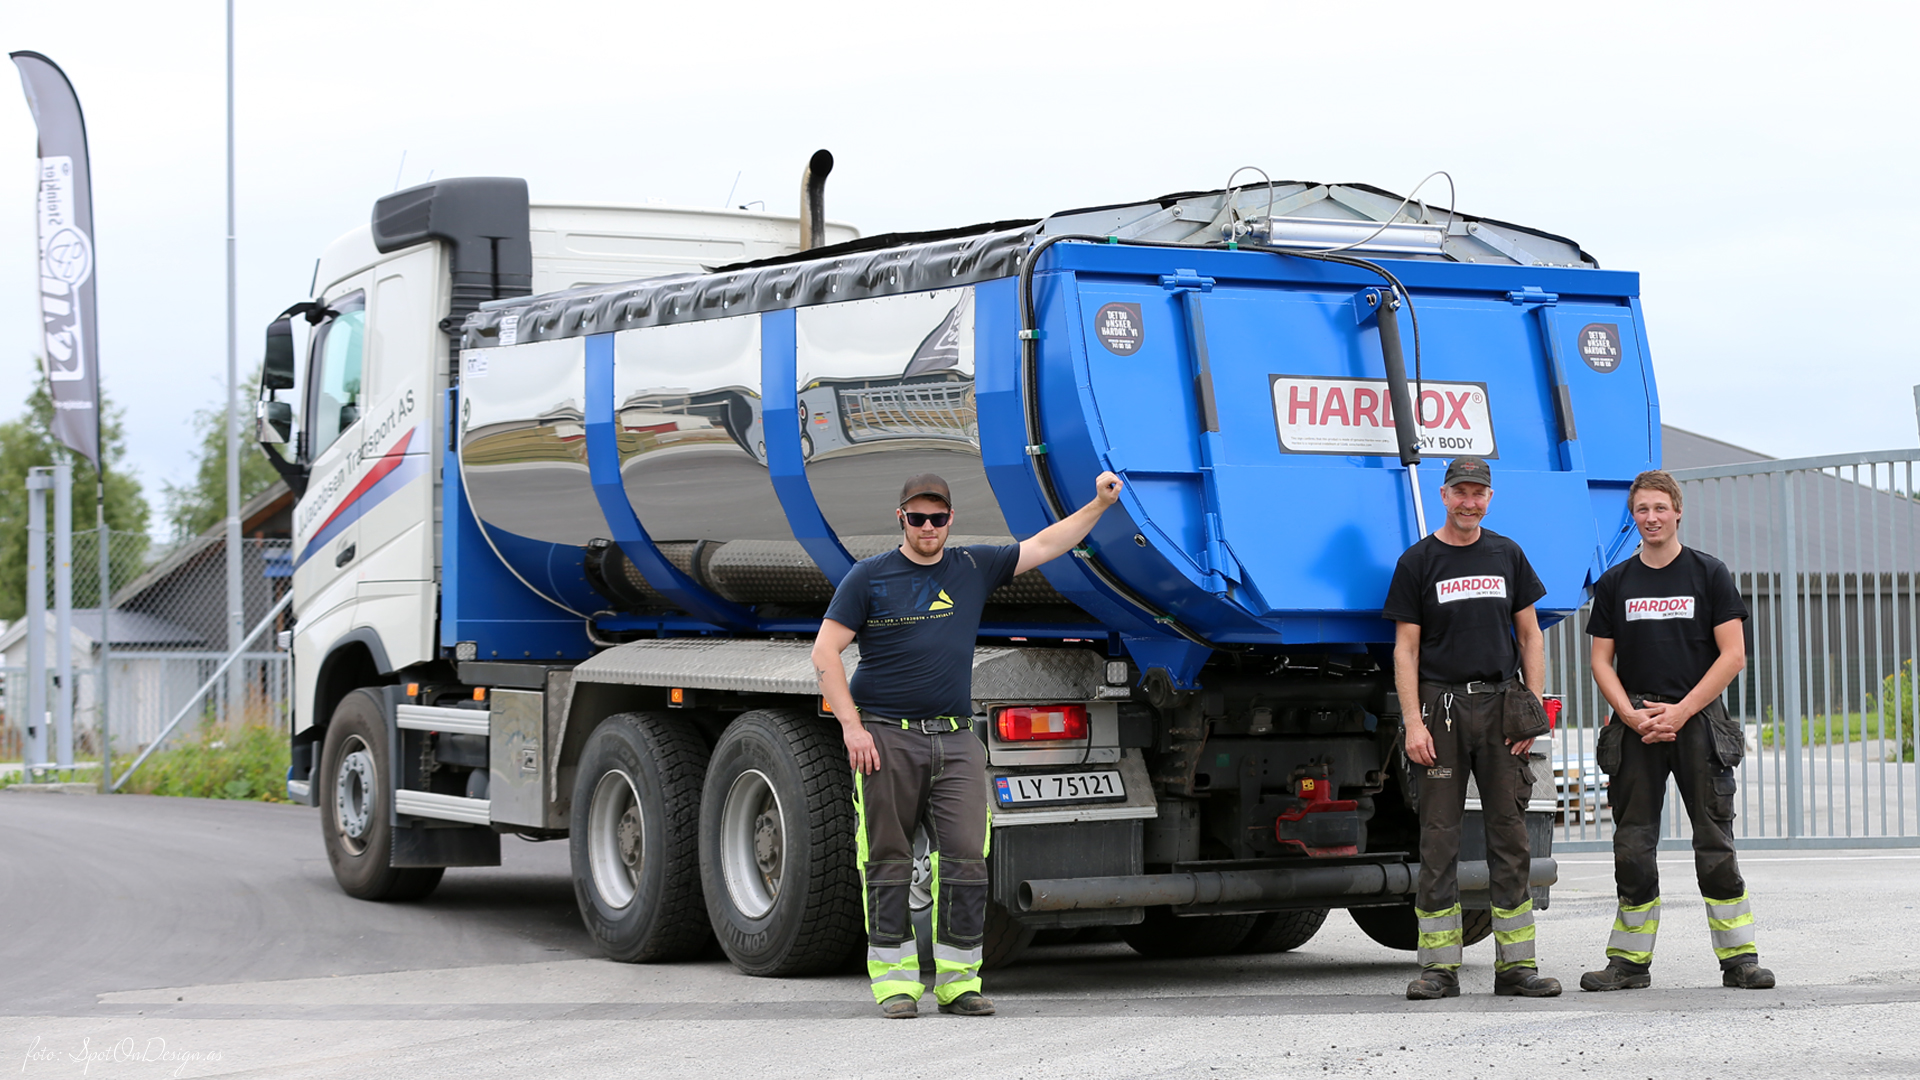 Asfaltbalje/Asfalttraug i Hardox 450 Stål levert · Kunde: J. Jacobsen Transport AS, Mo i Rana